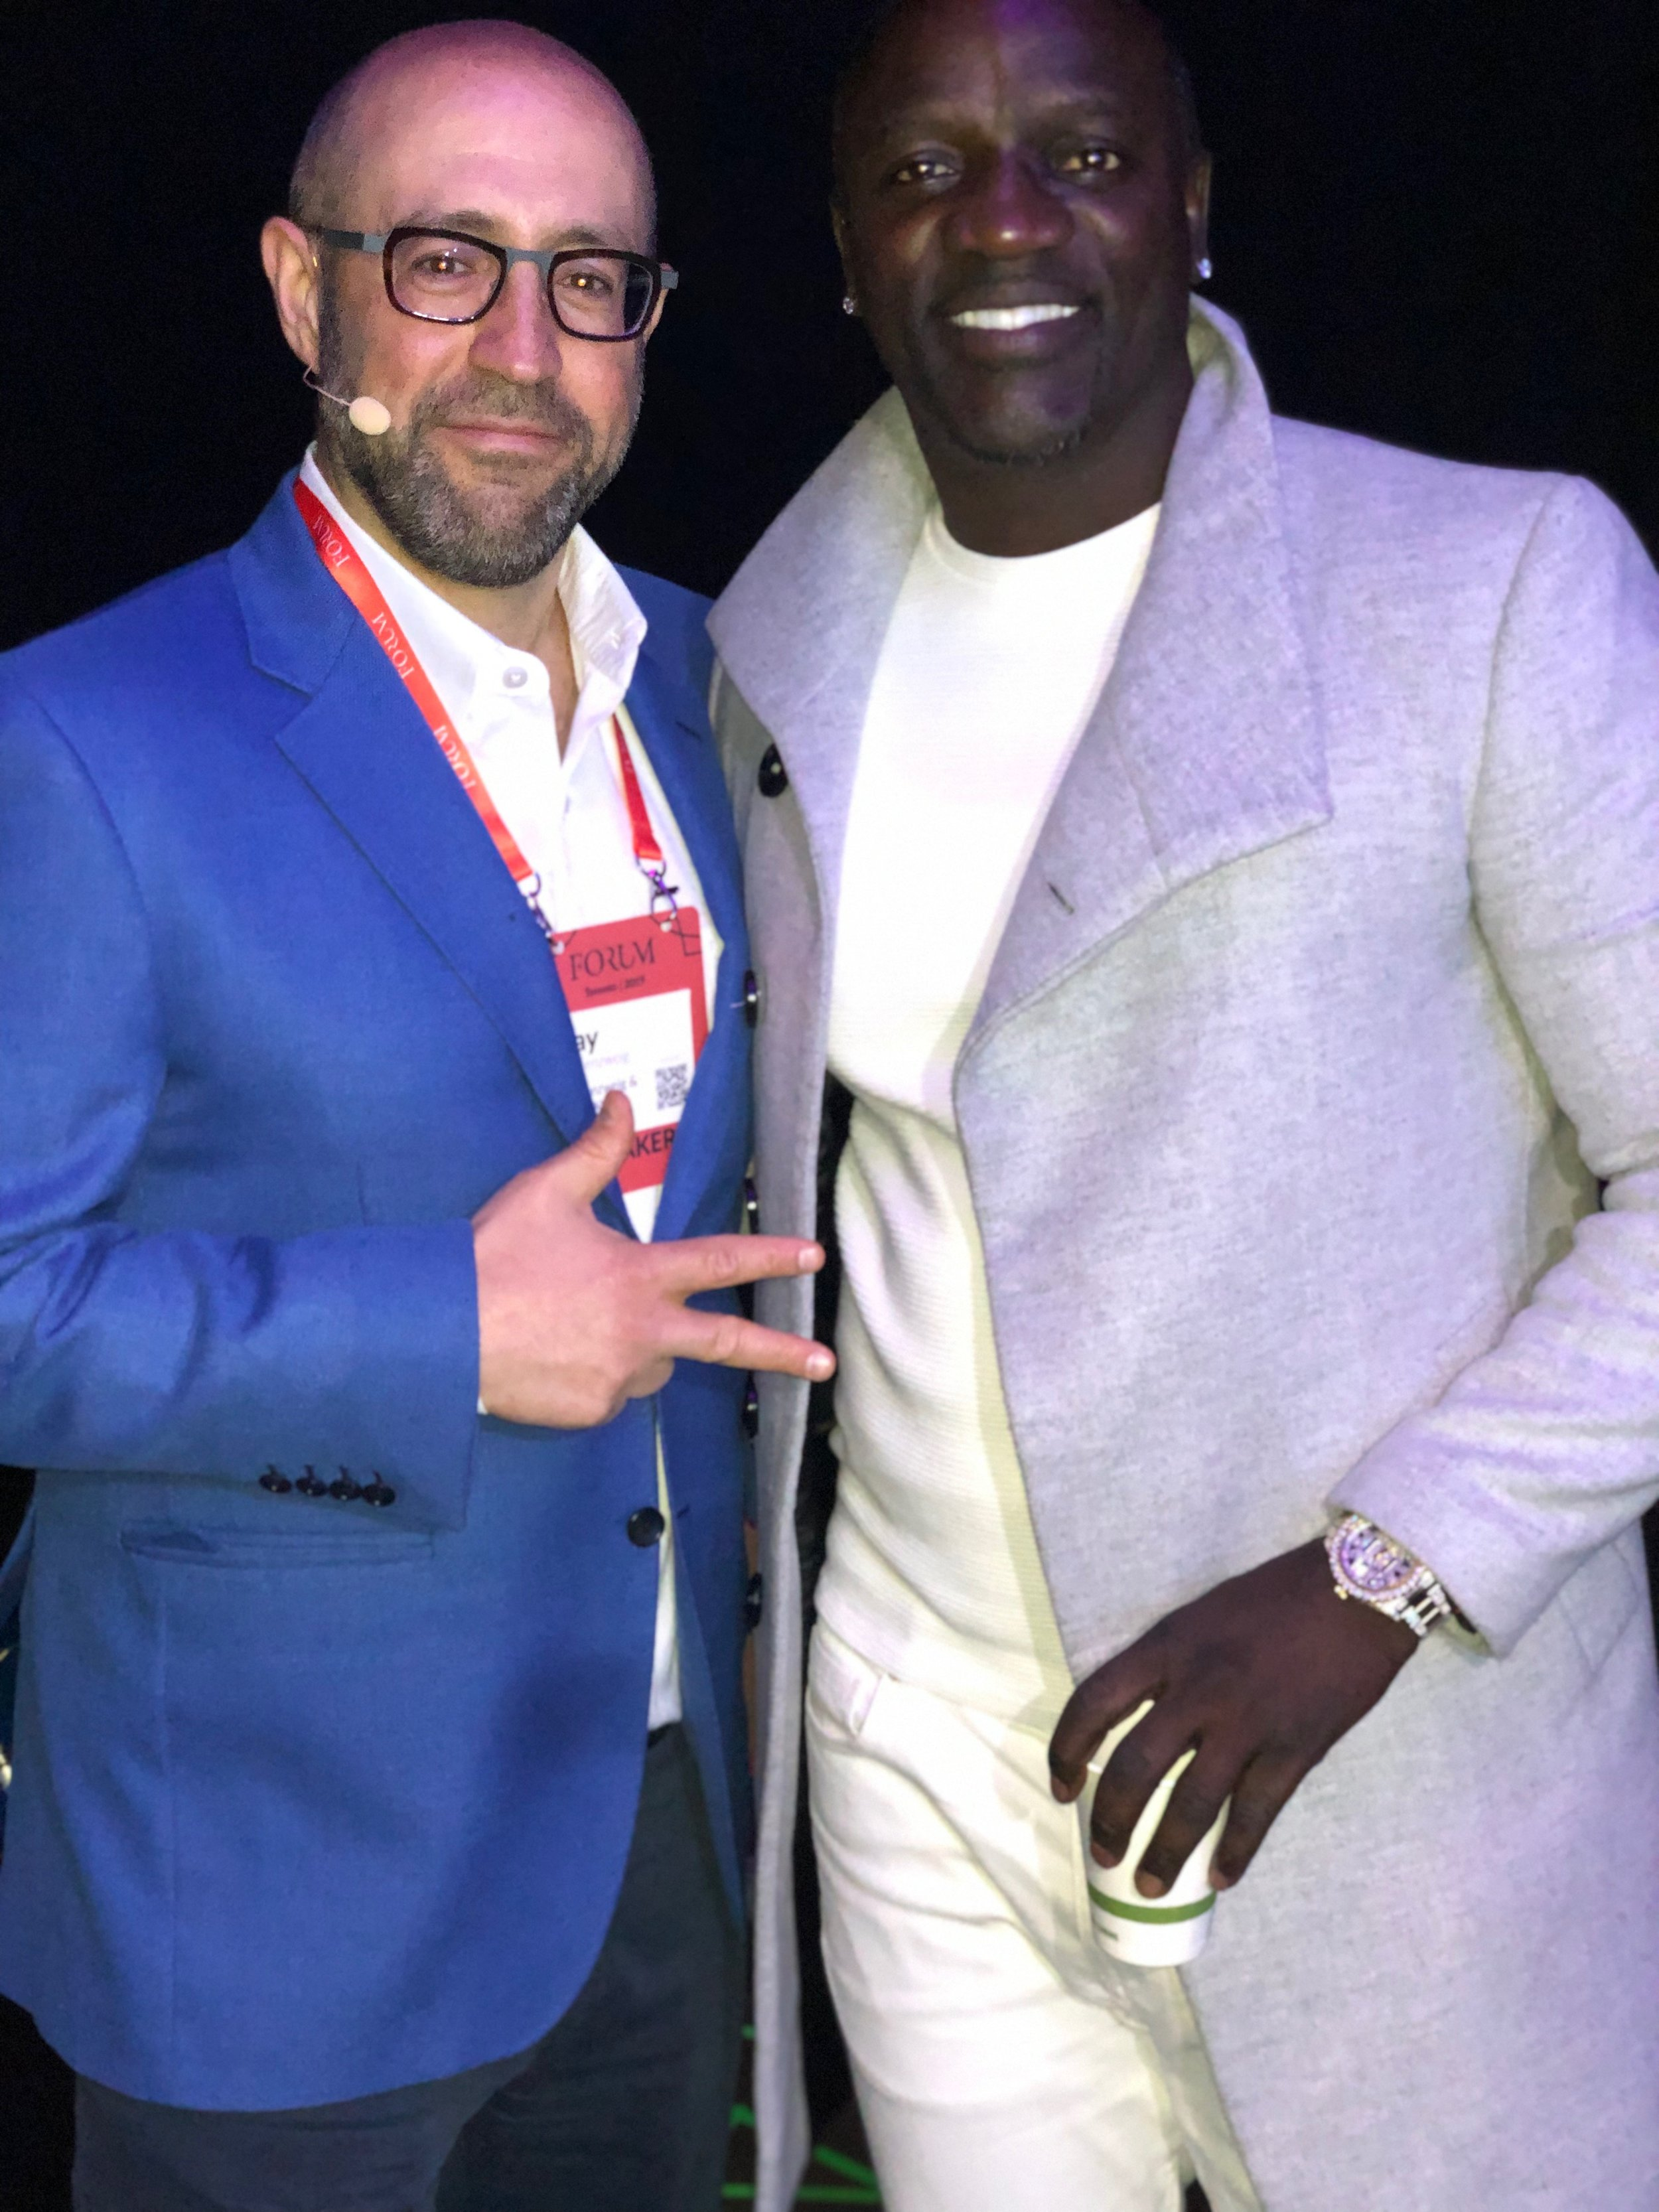 RCI - Jay Rosenzweig & Akon 20180522.jpeg